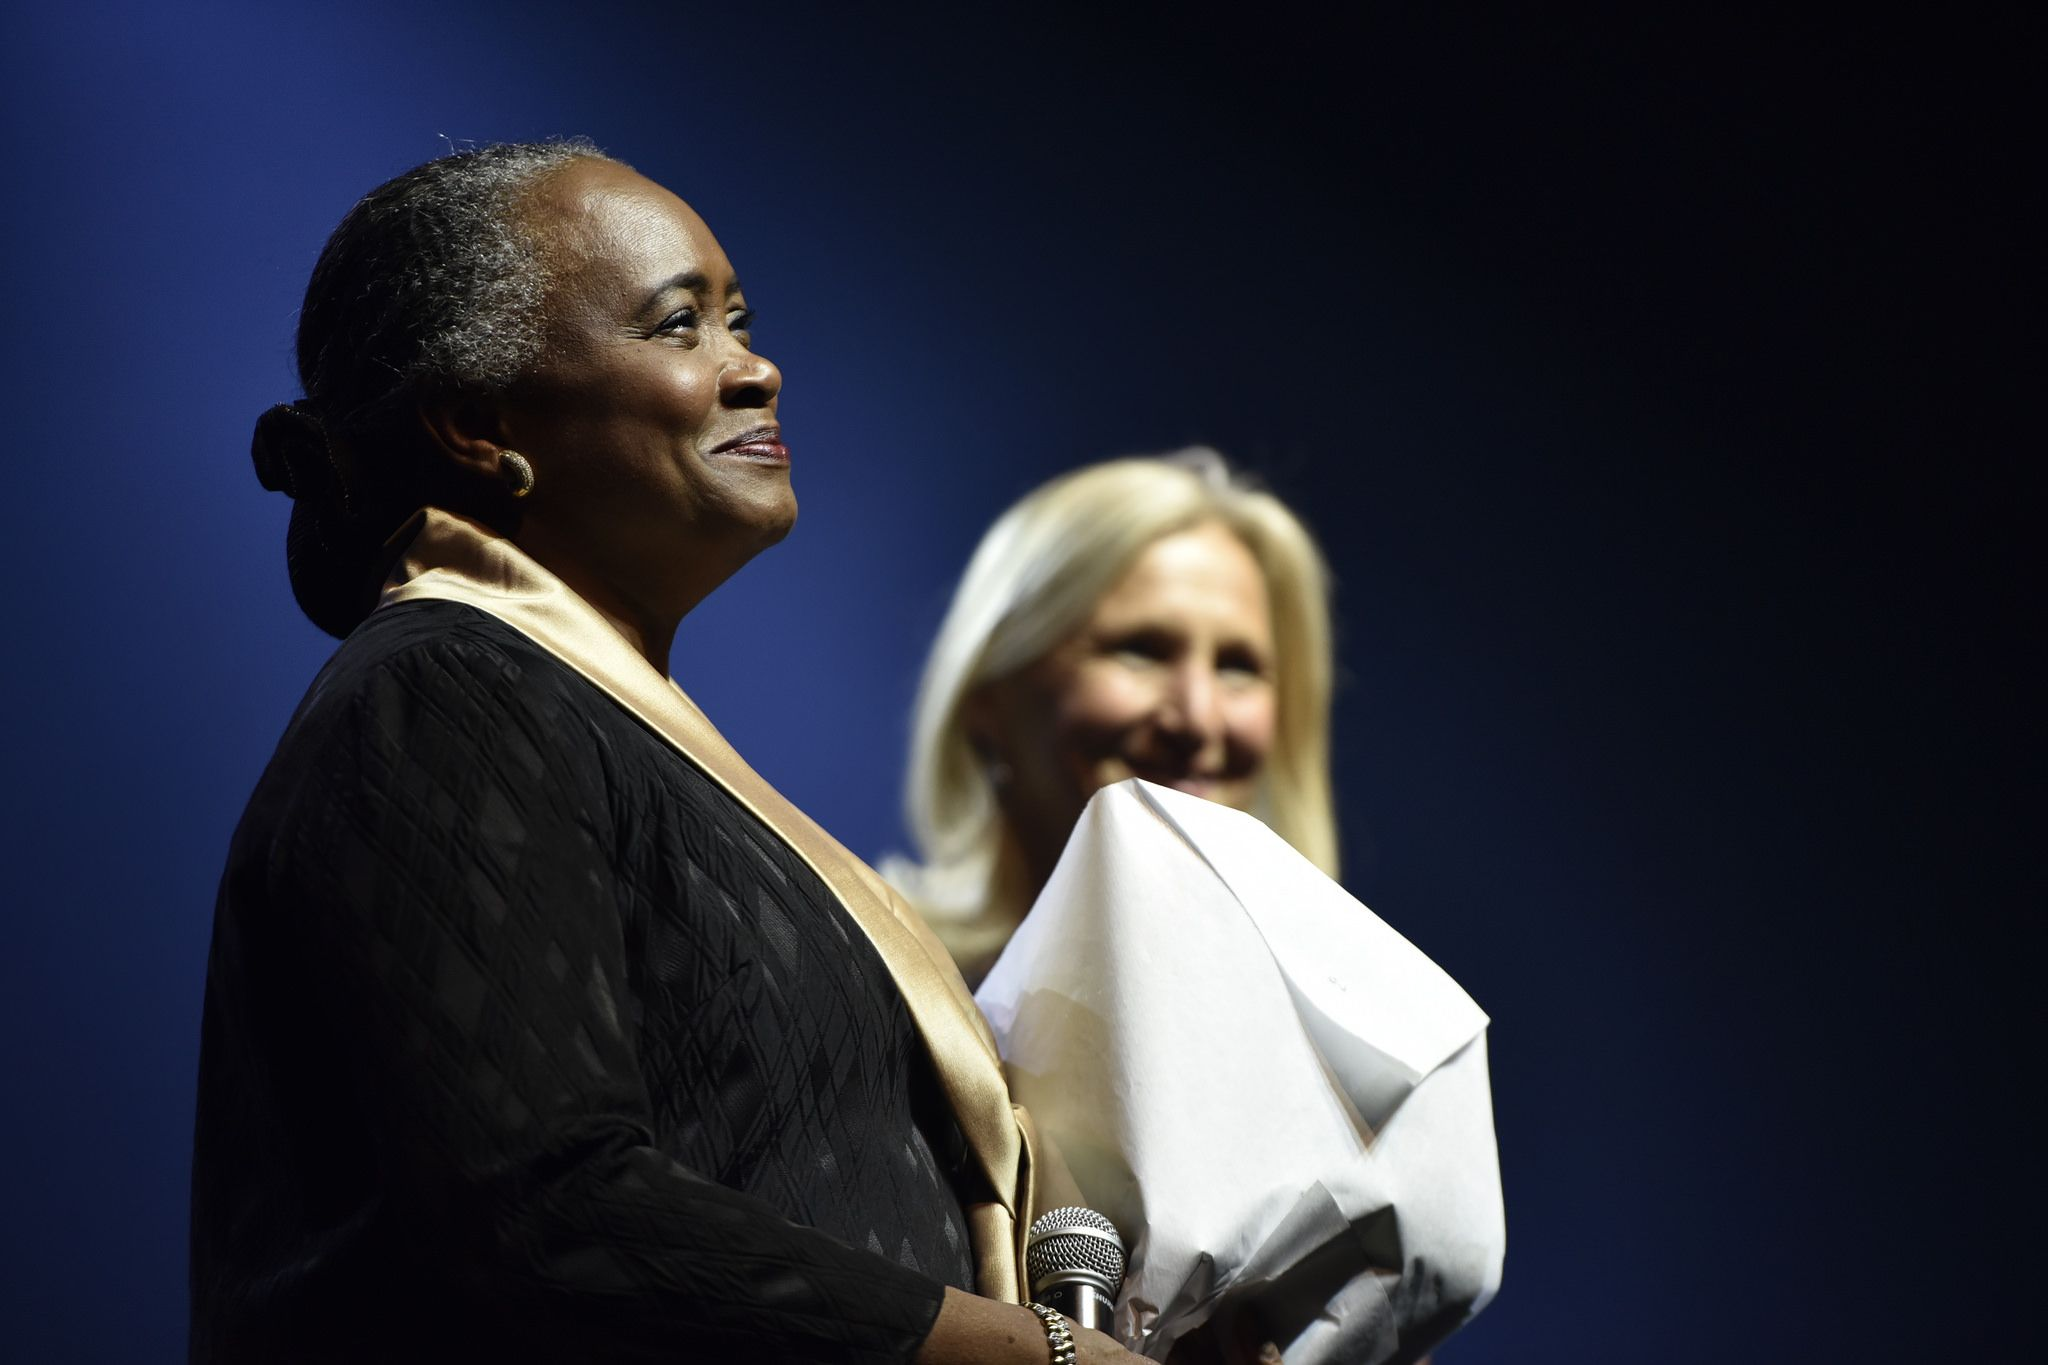 Barbara Hendricks And Clara Gaymard On Stage